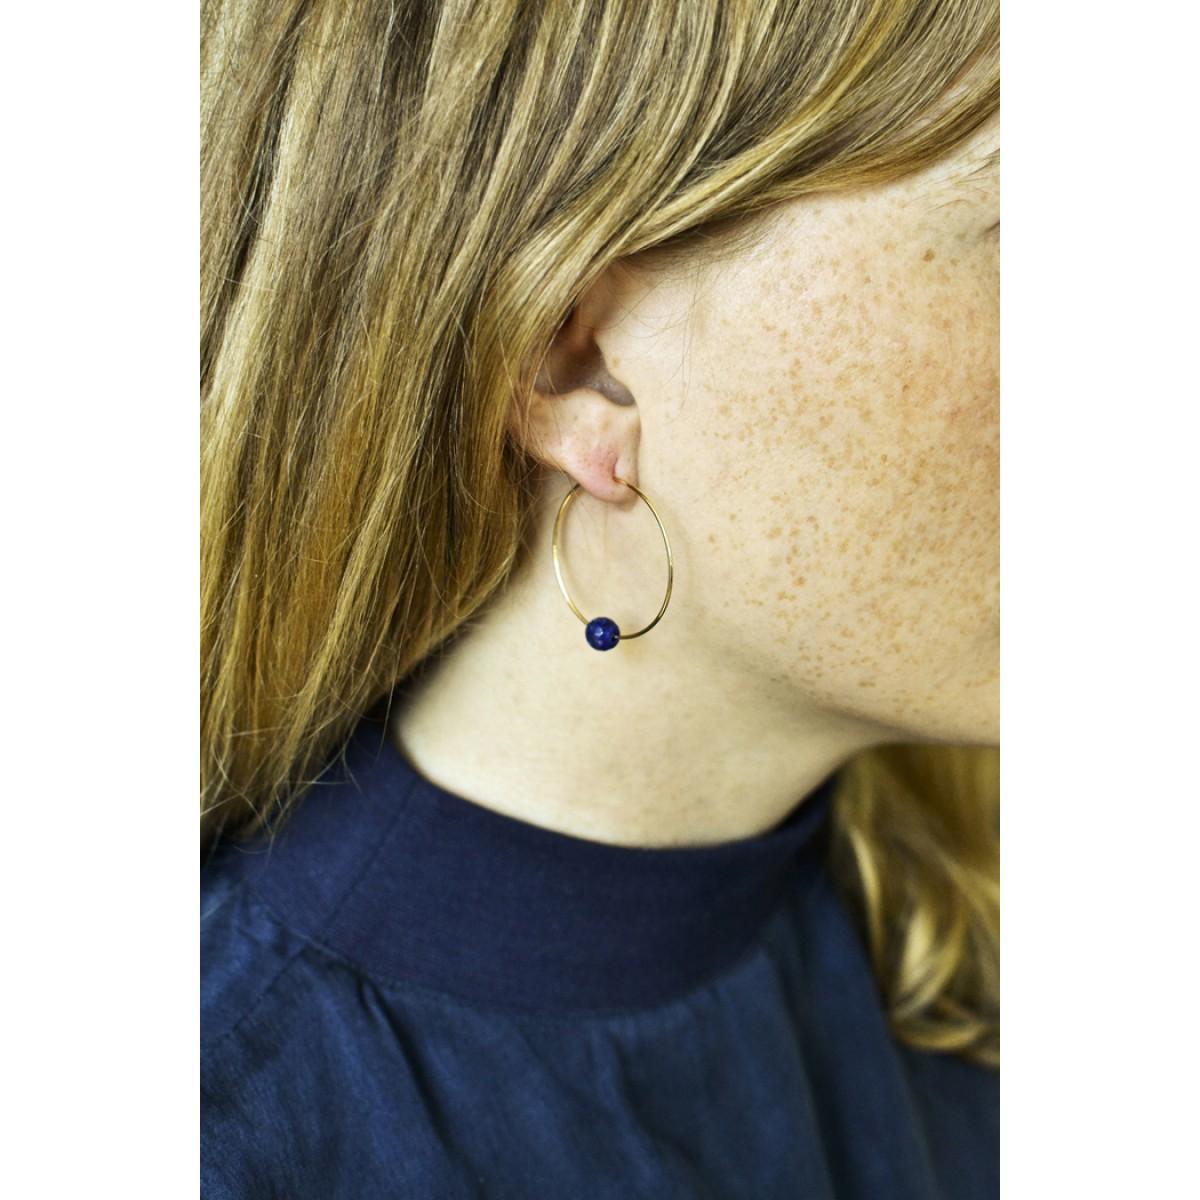 Gudbling // Vergoldete Ohrringe mit Malachit